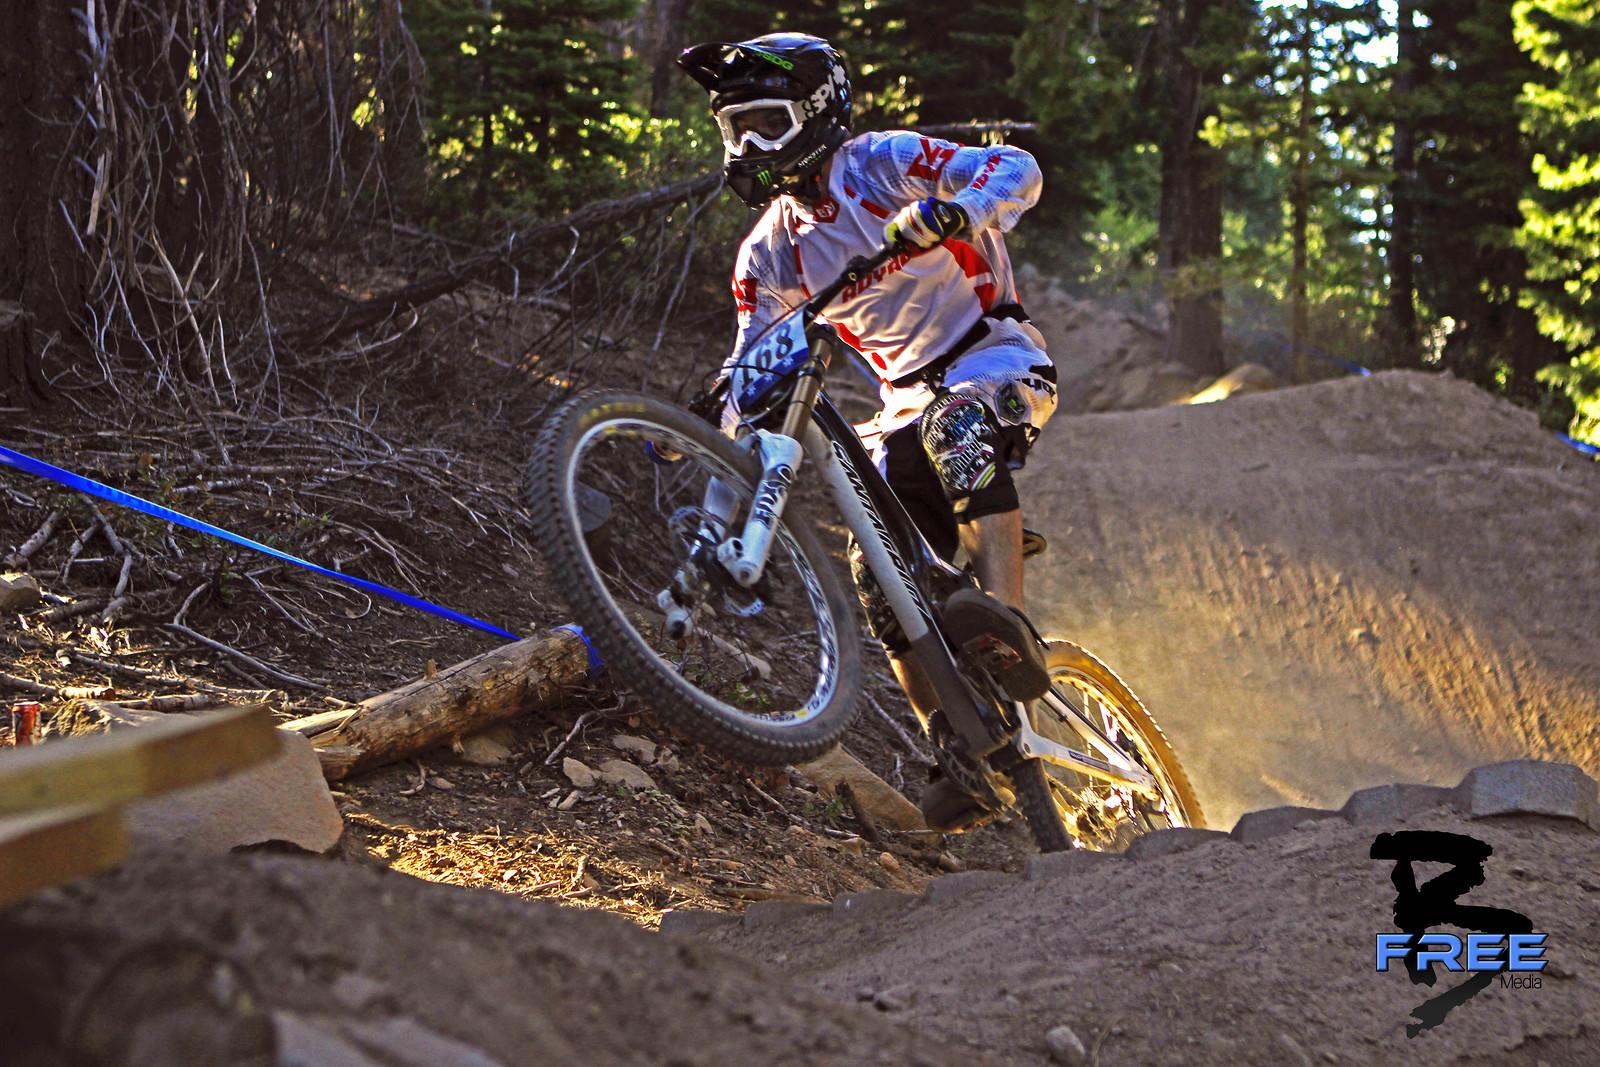 done9 1 - GnarHuck - Mountain Biking Pictures - Vital MTB